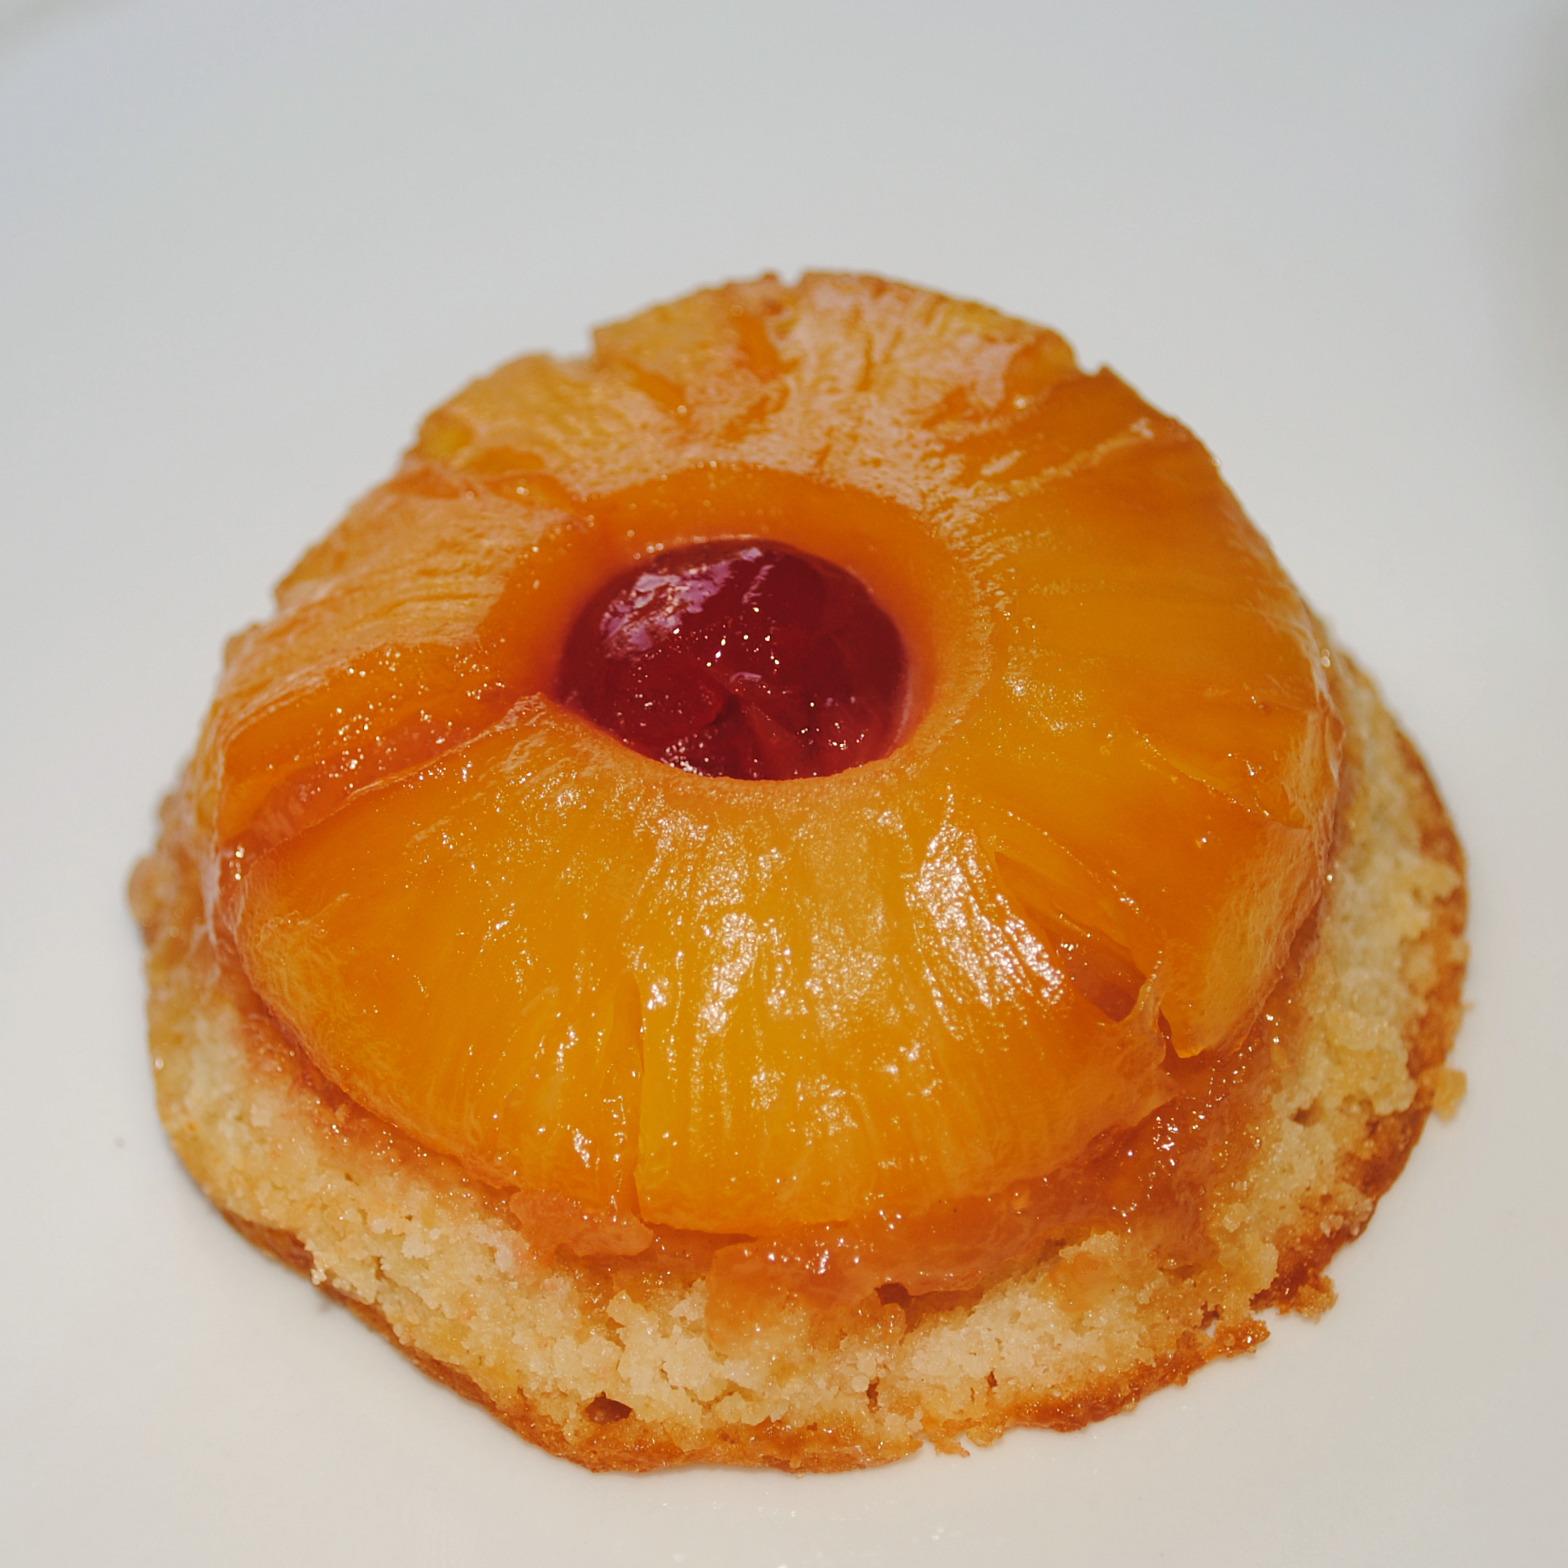 Homemade By Holman Pineapple Upside Down Cupcakes